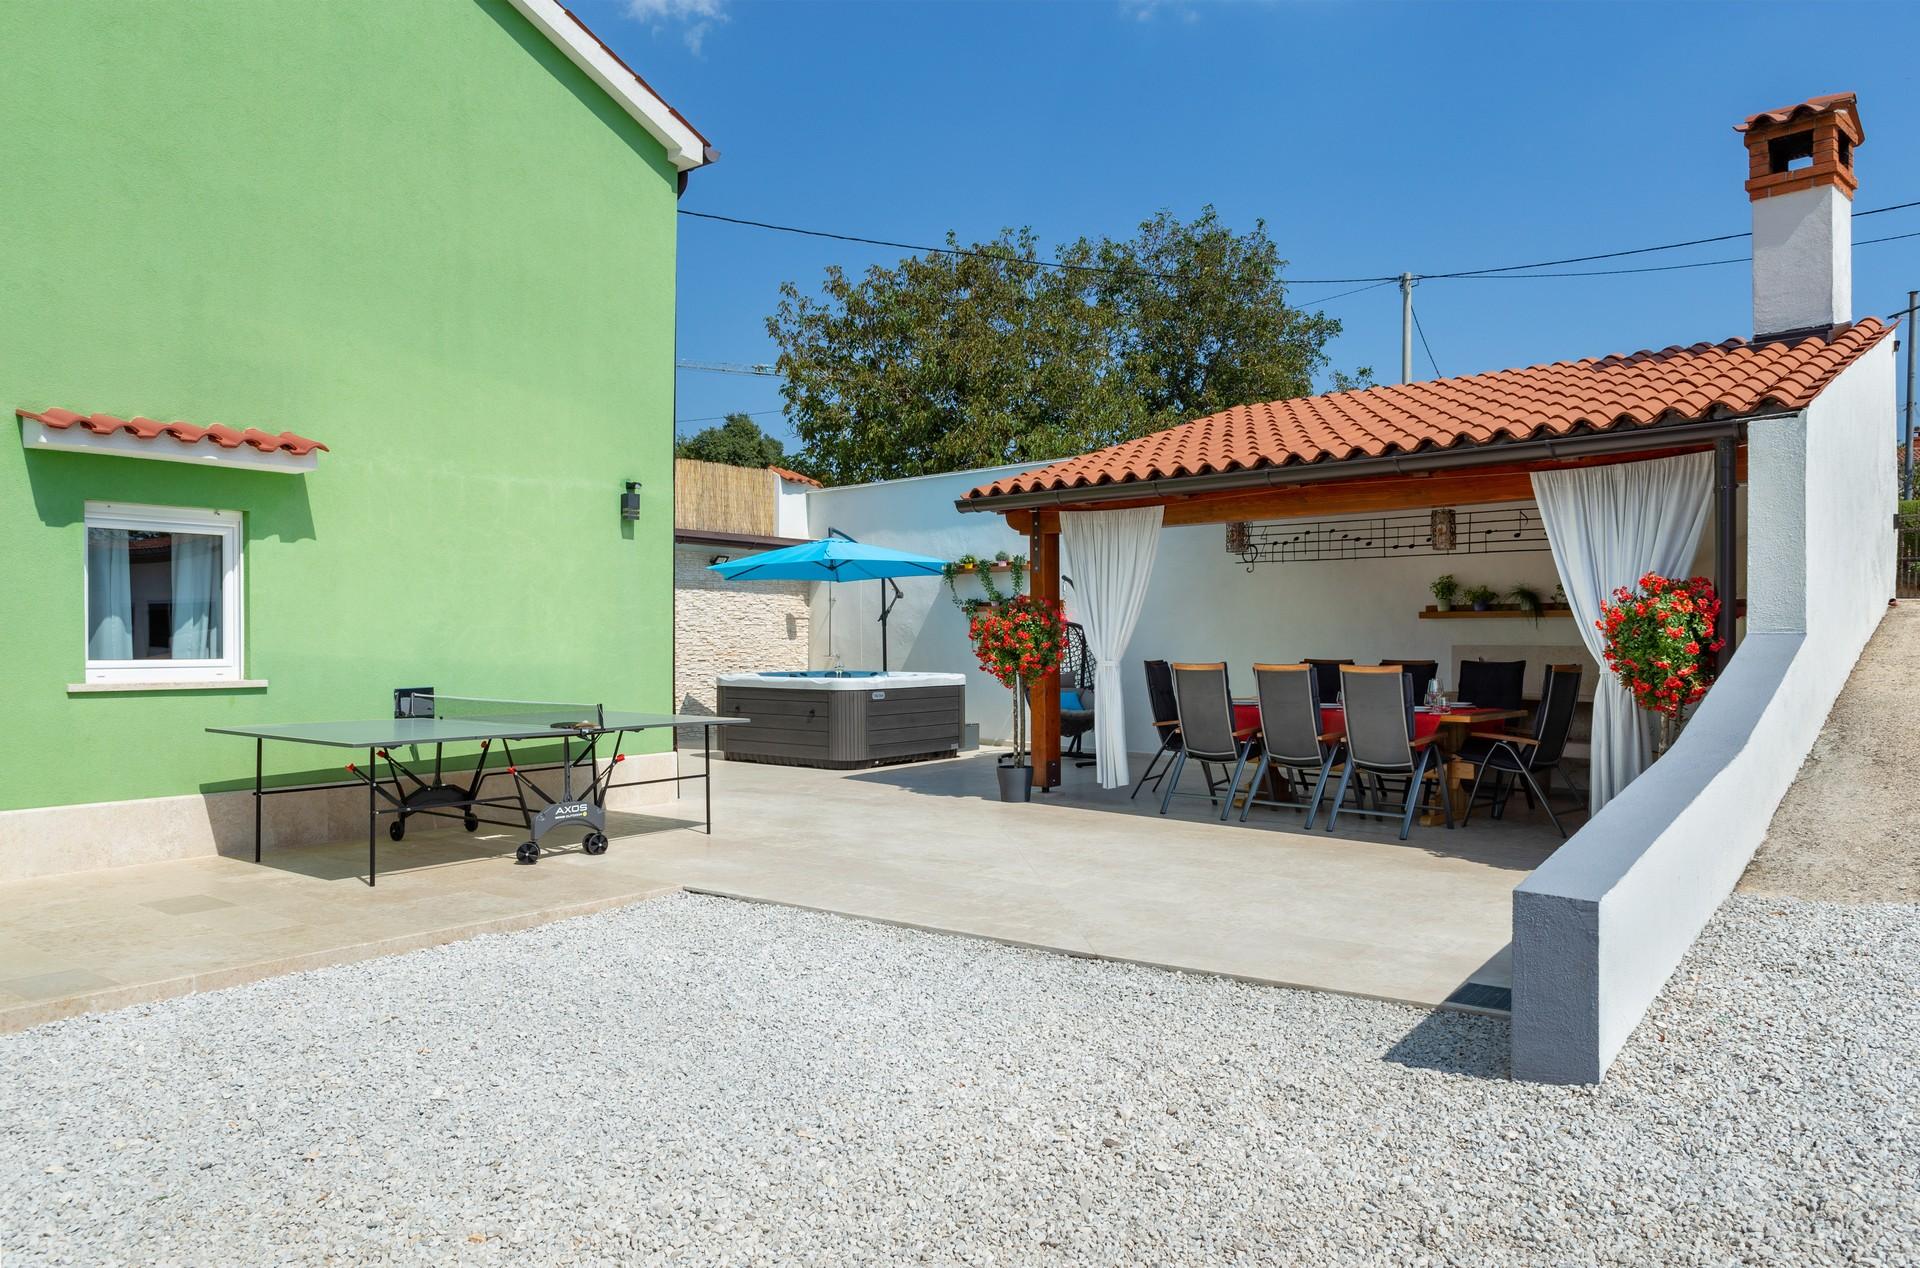 villa deal outdoors (25)